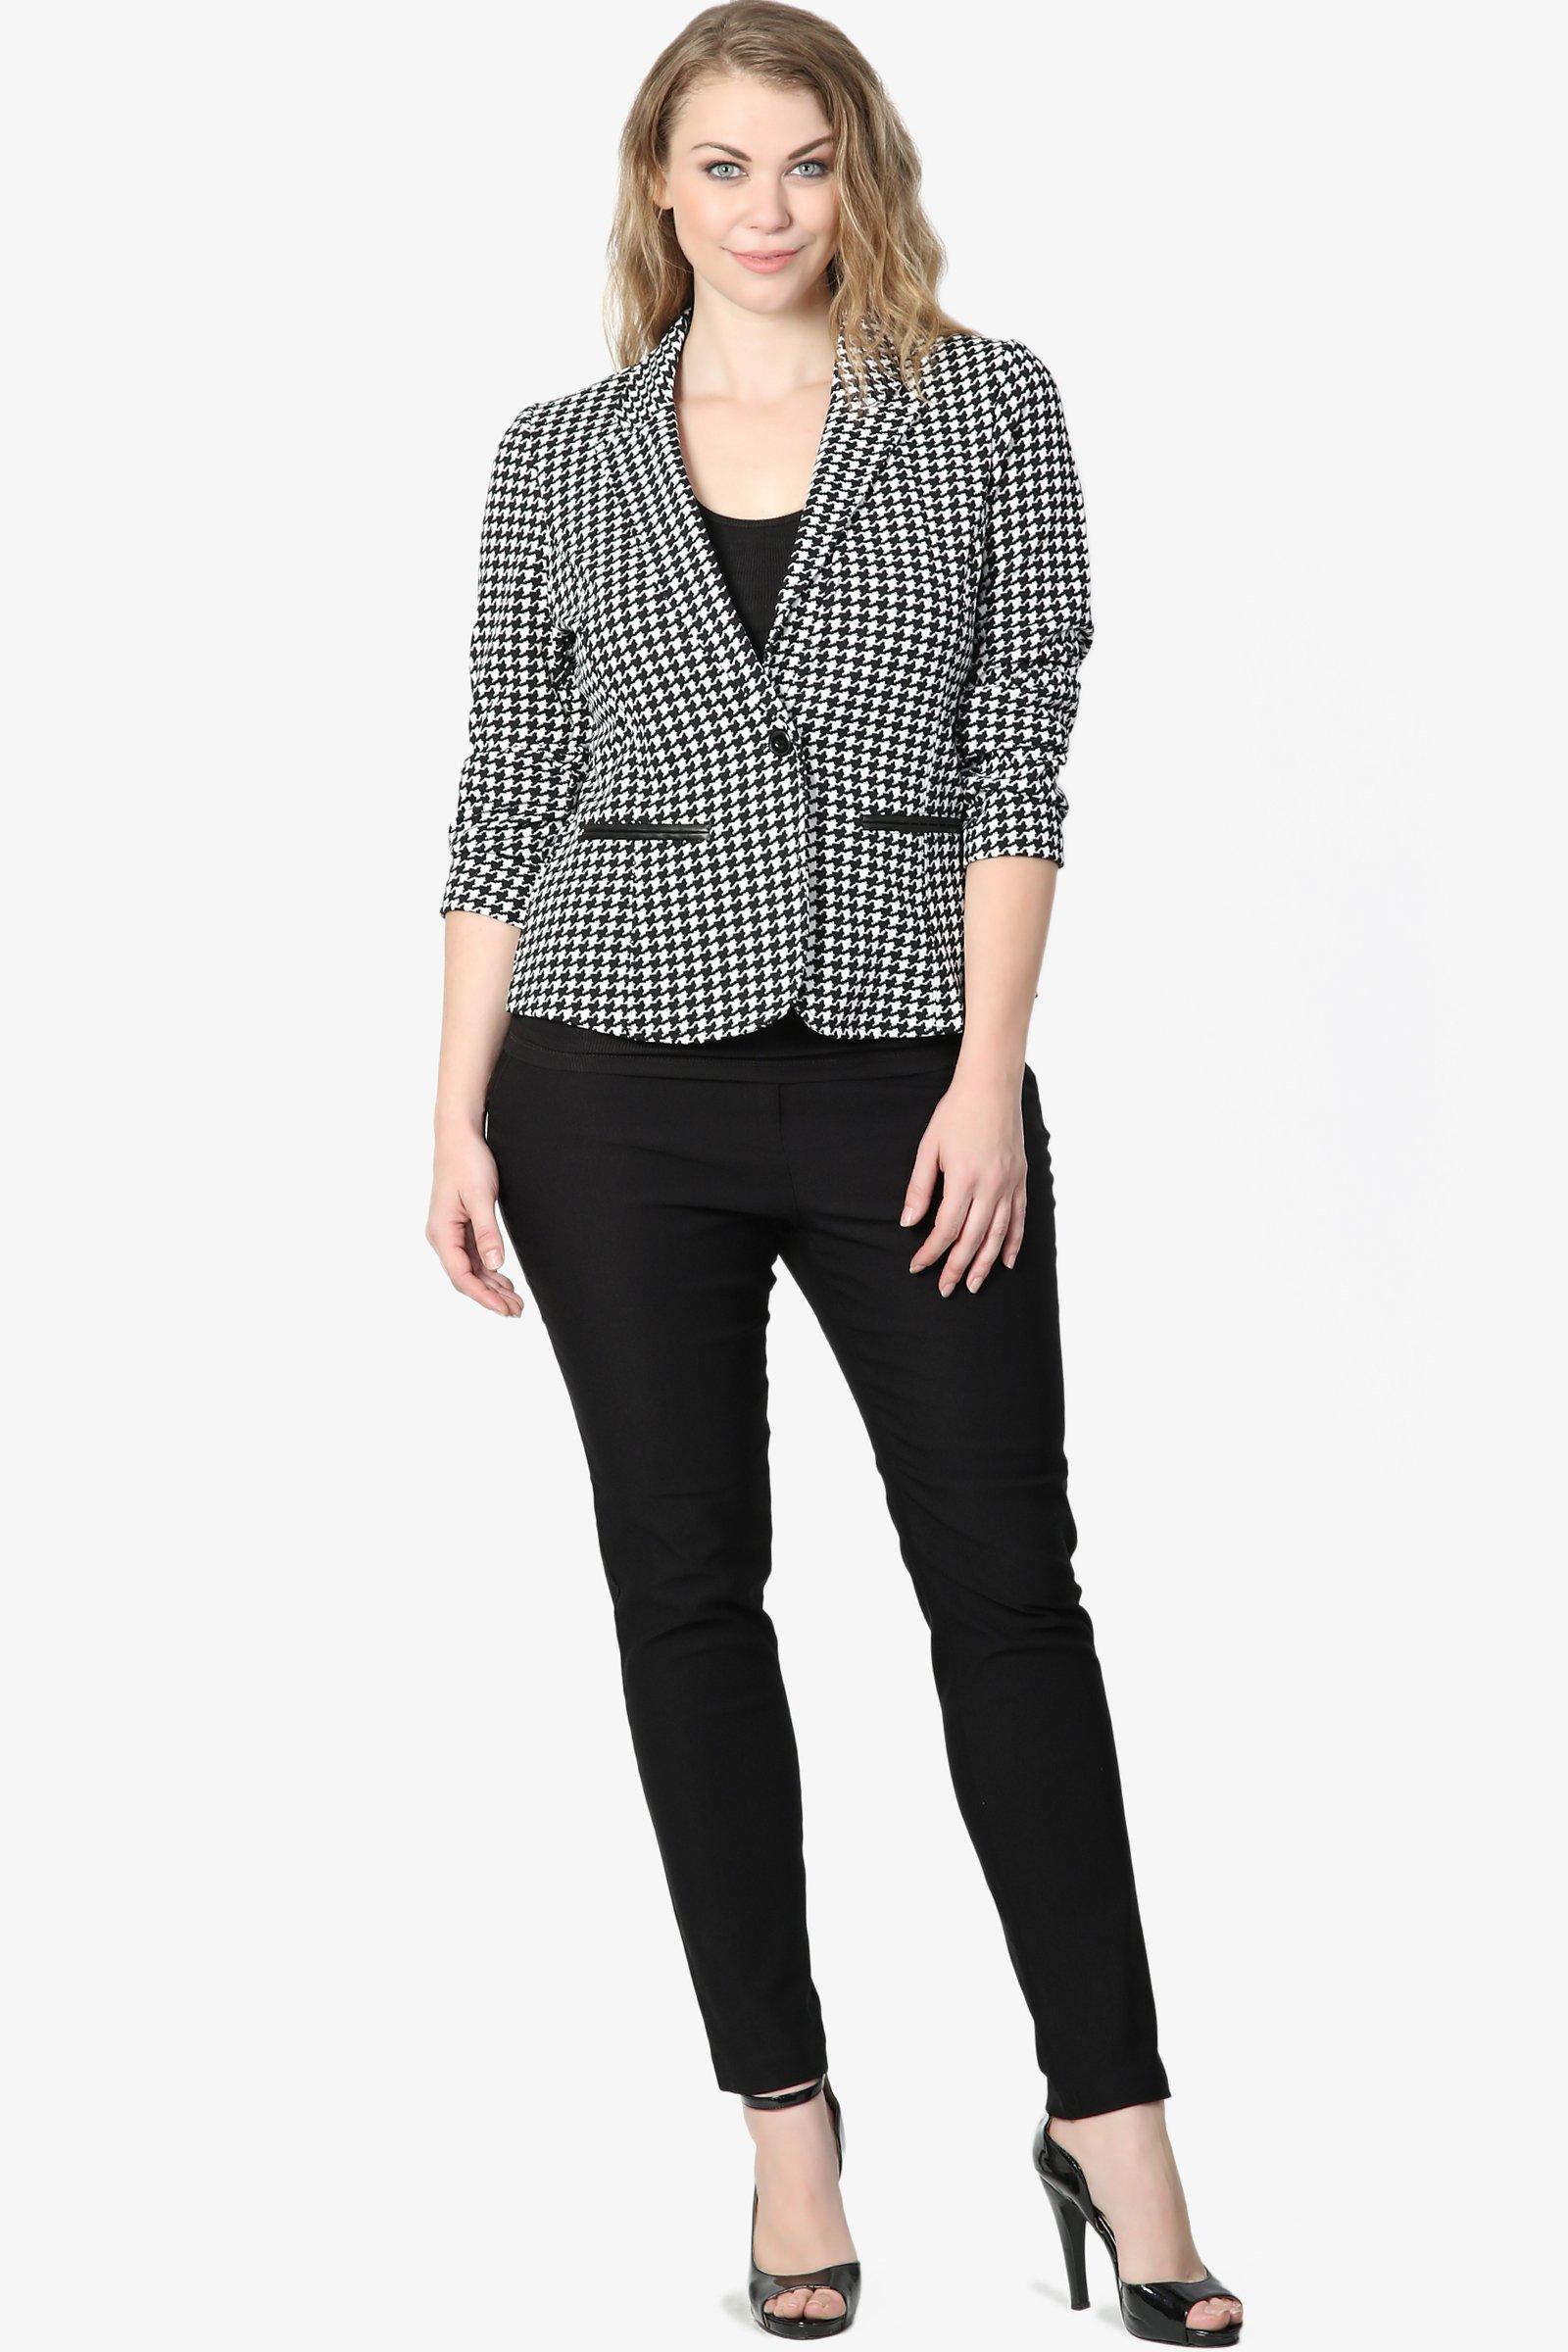 TheMogan Junior's Checker Faux Leather Pocket Slim Fit Blazer Jacket Black 1XL by TheMogan (Image #6)